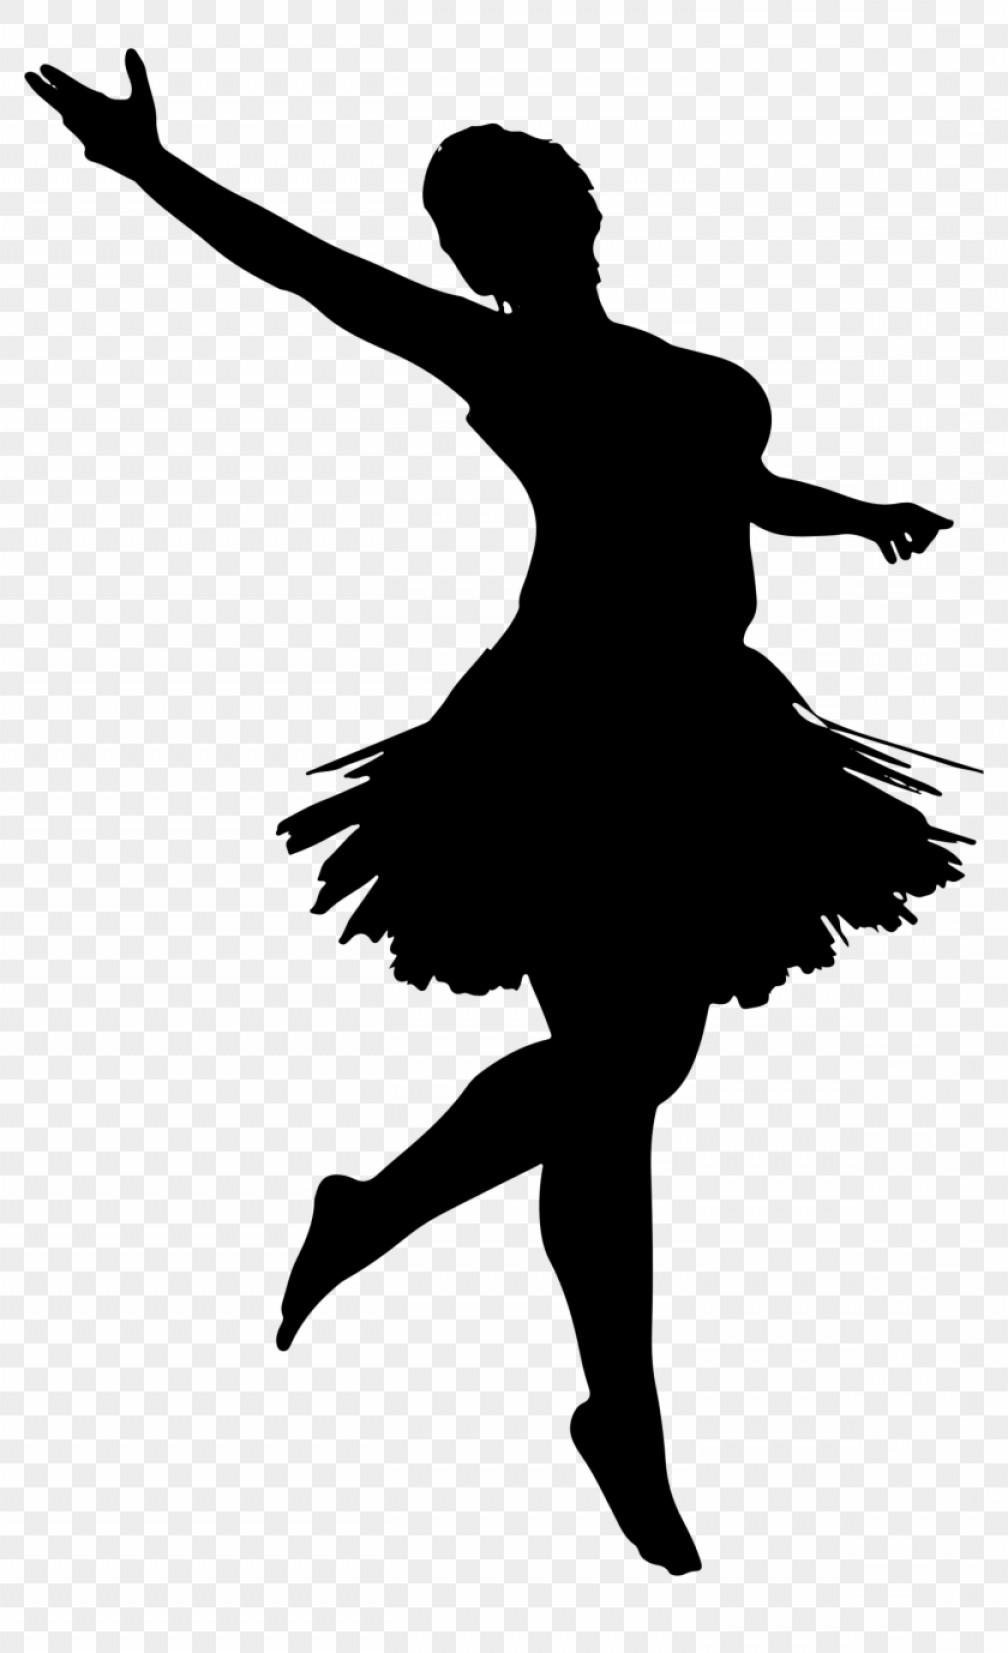 Mibibadiballerina Silhouette Dancing Girl Vector Png.